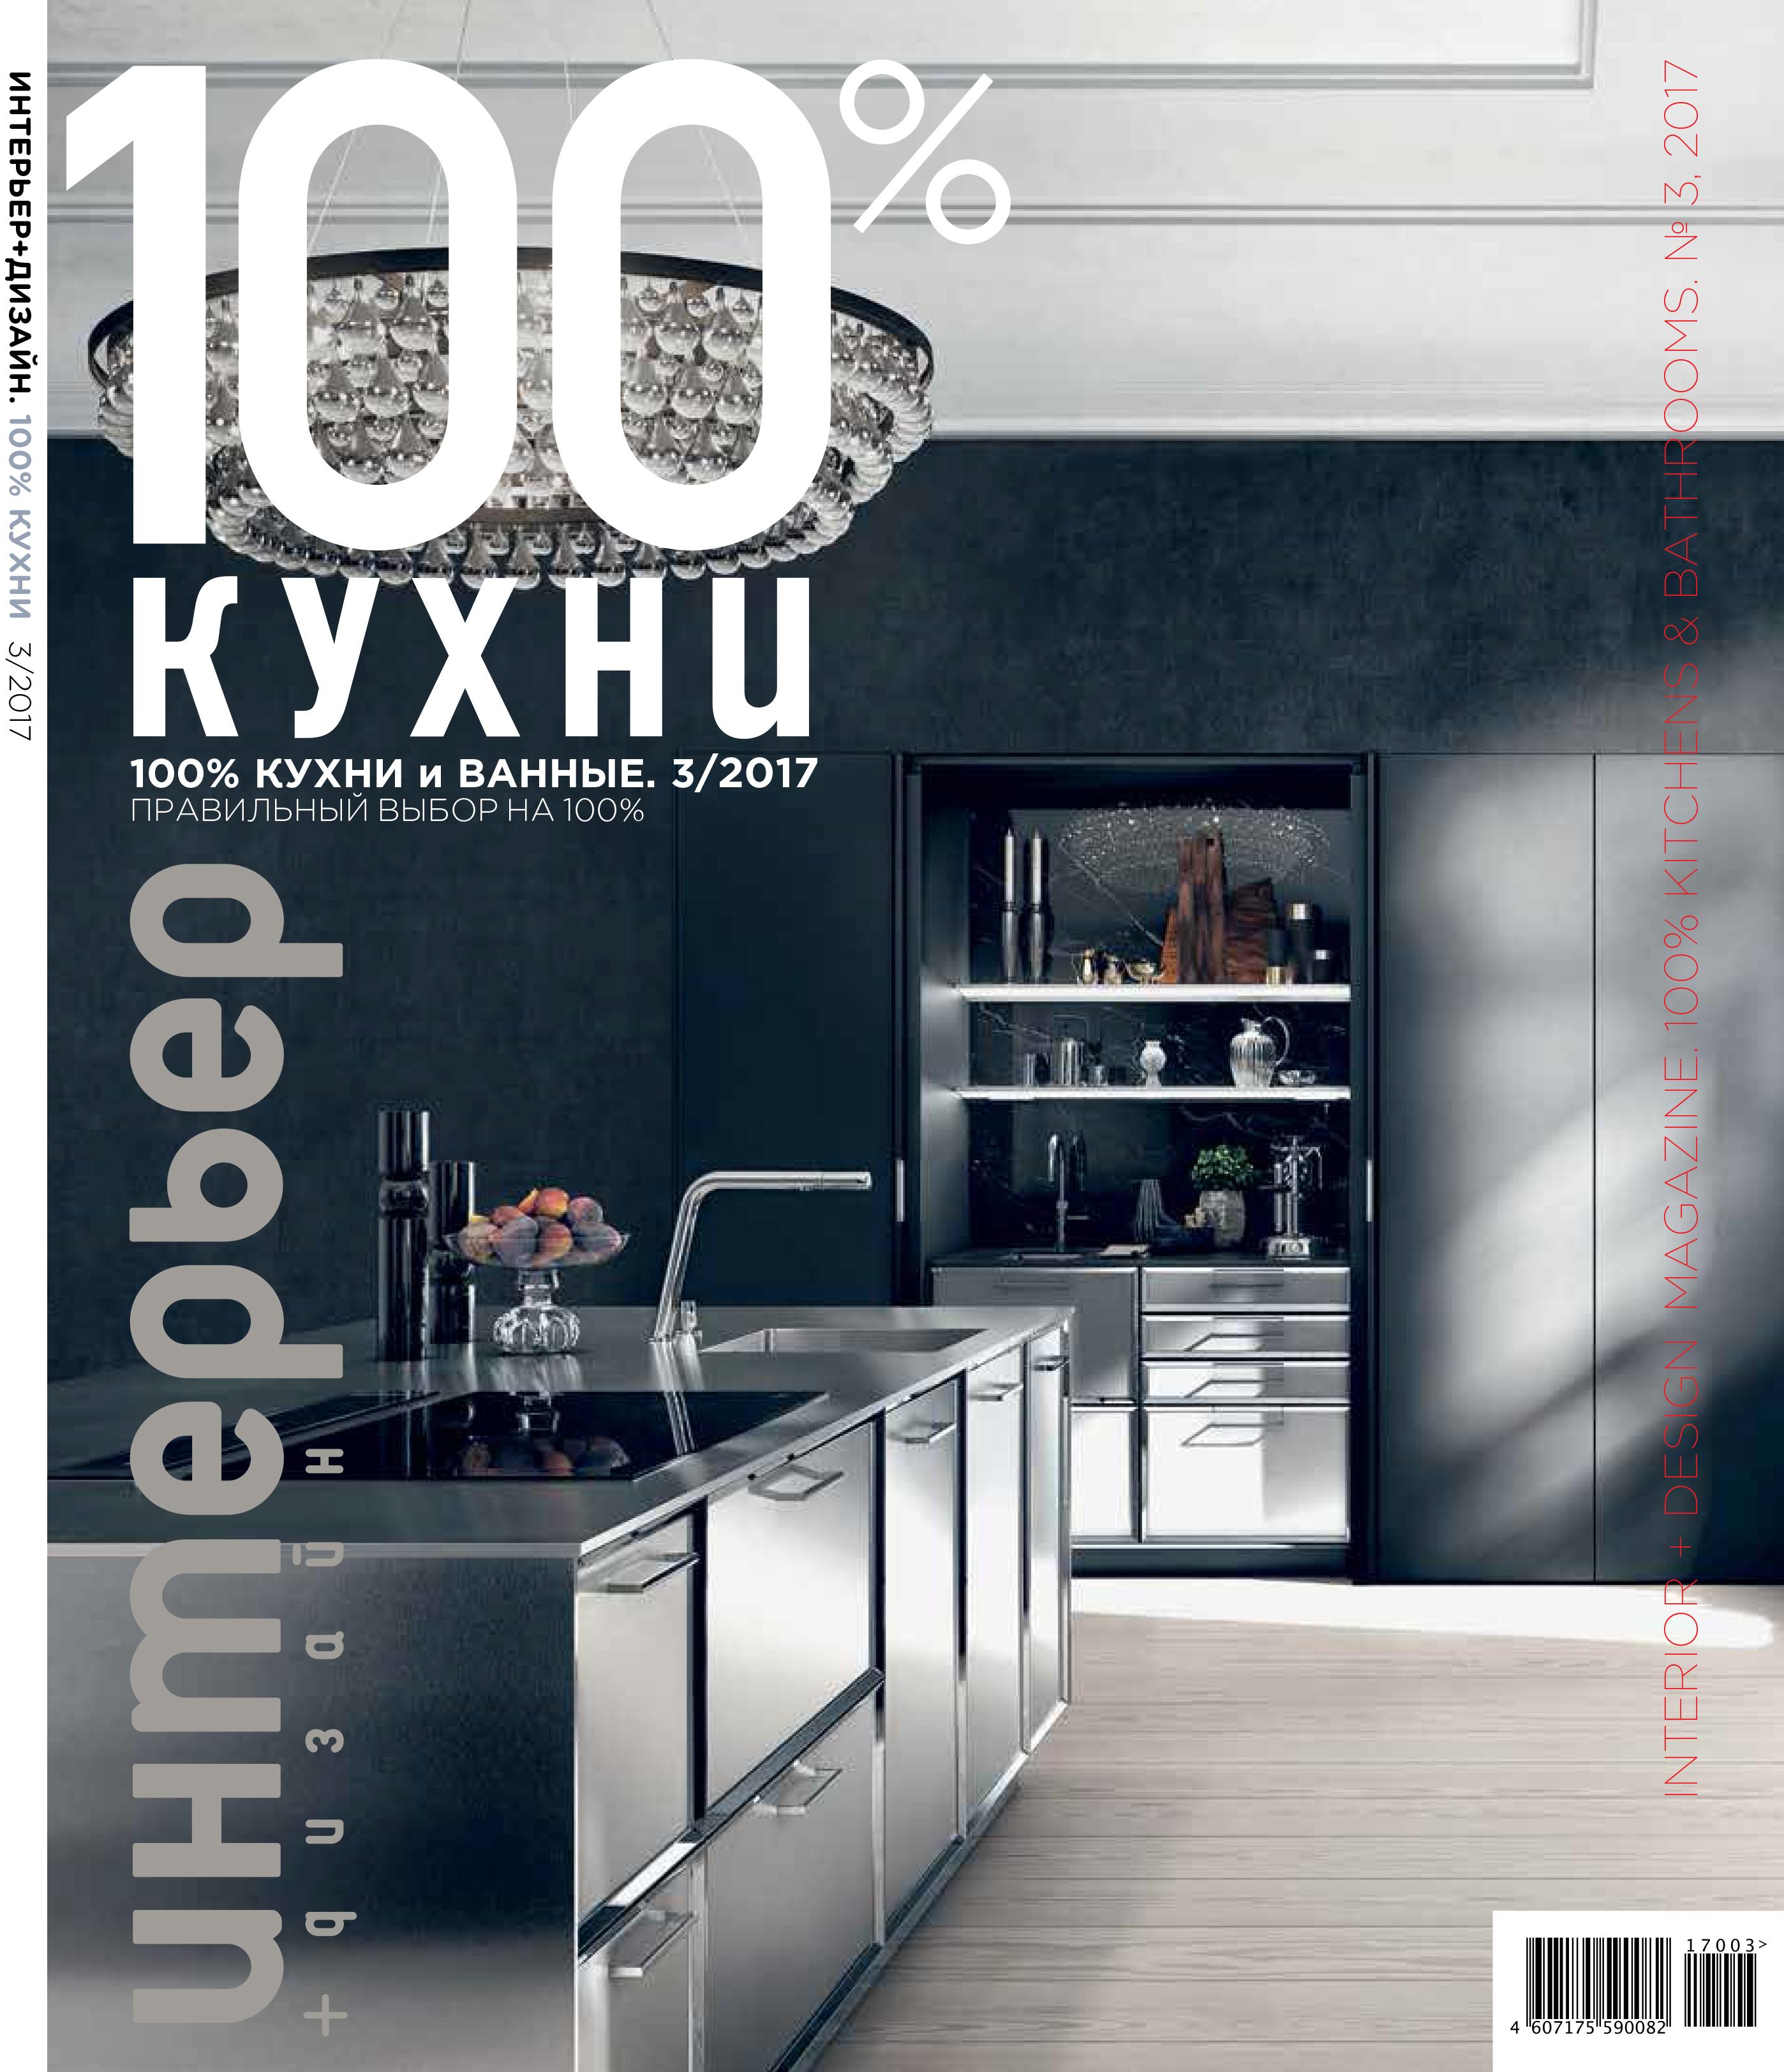 INTERIOR DESIGN MAGAZINE, 100% KITCHENS AND BATHROOMS, 03 ...